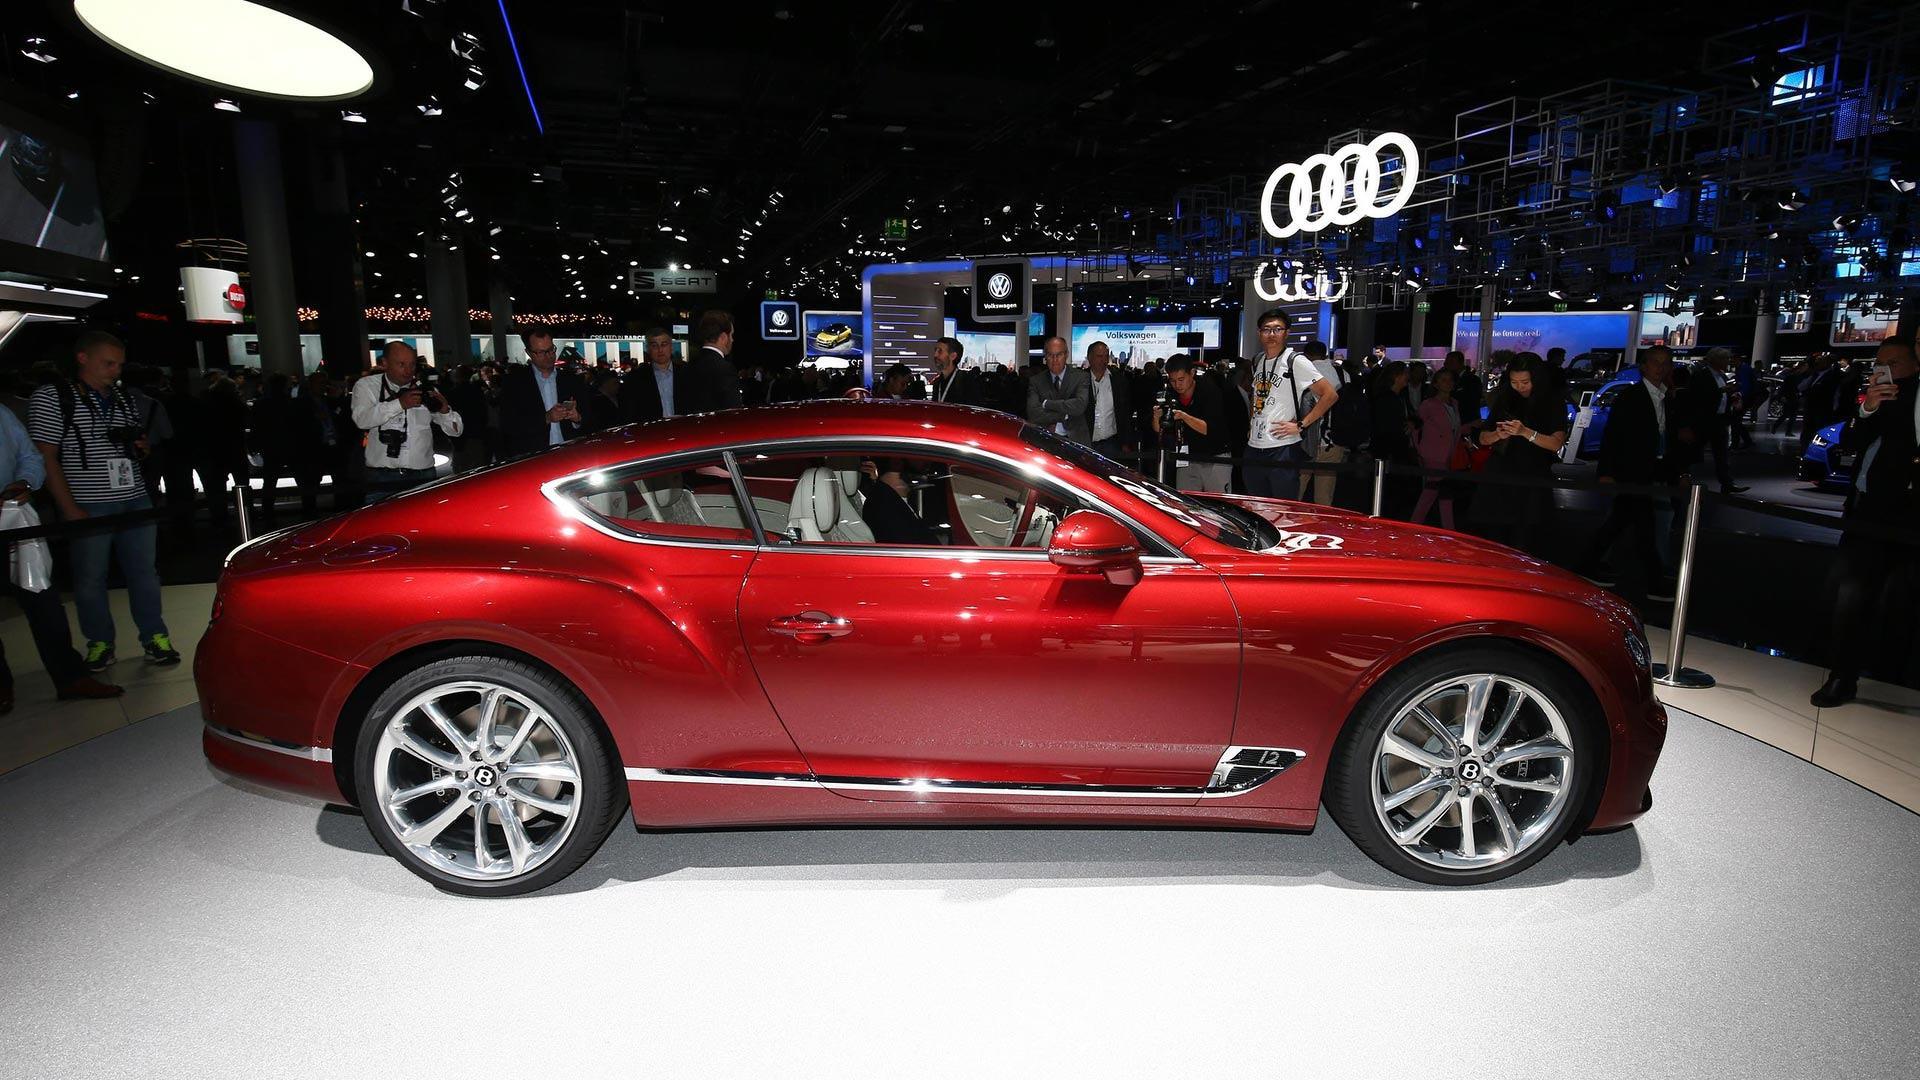 2018 Bentley Continental Gt Dazzles Crowd With New Design At Frankfurt